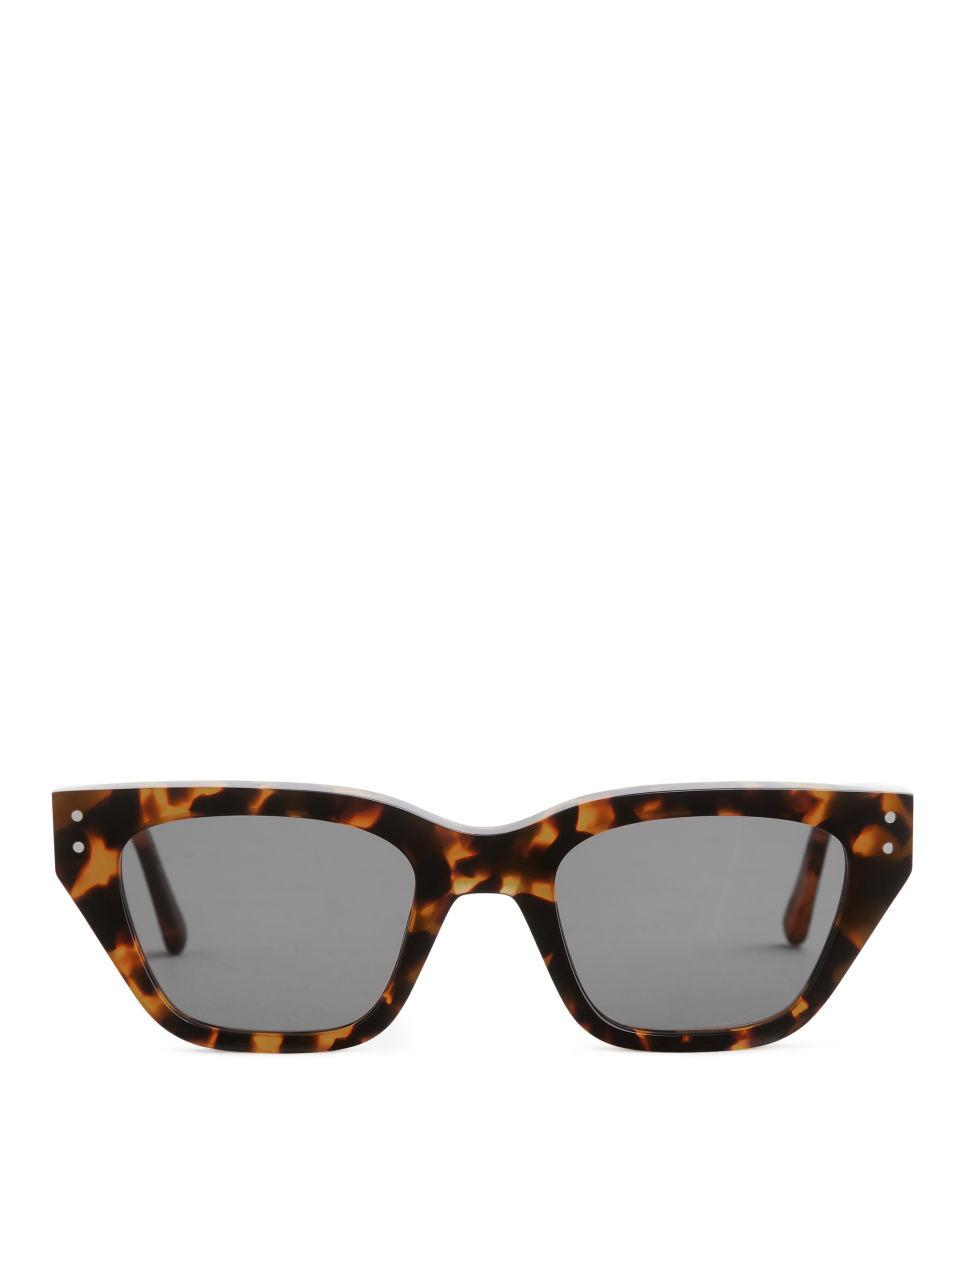 Monokel Eyewear Memphis Sunglasses - Orange